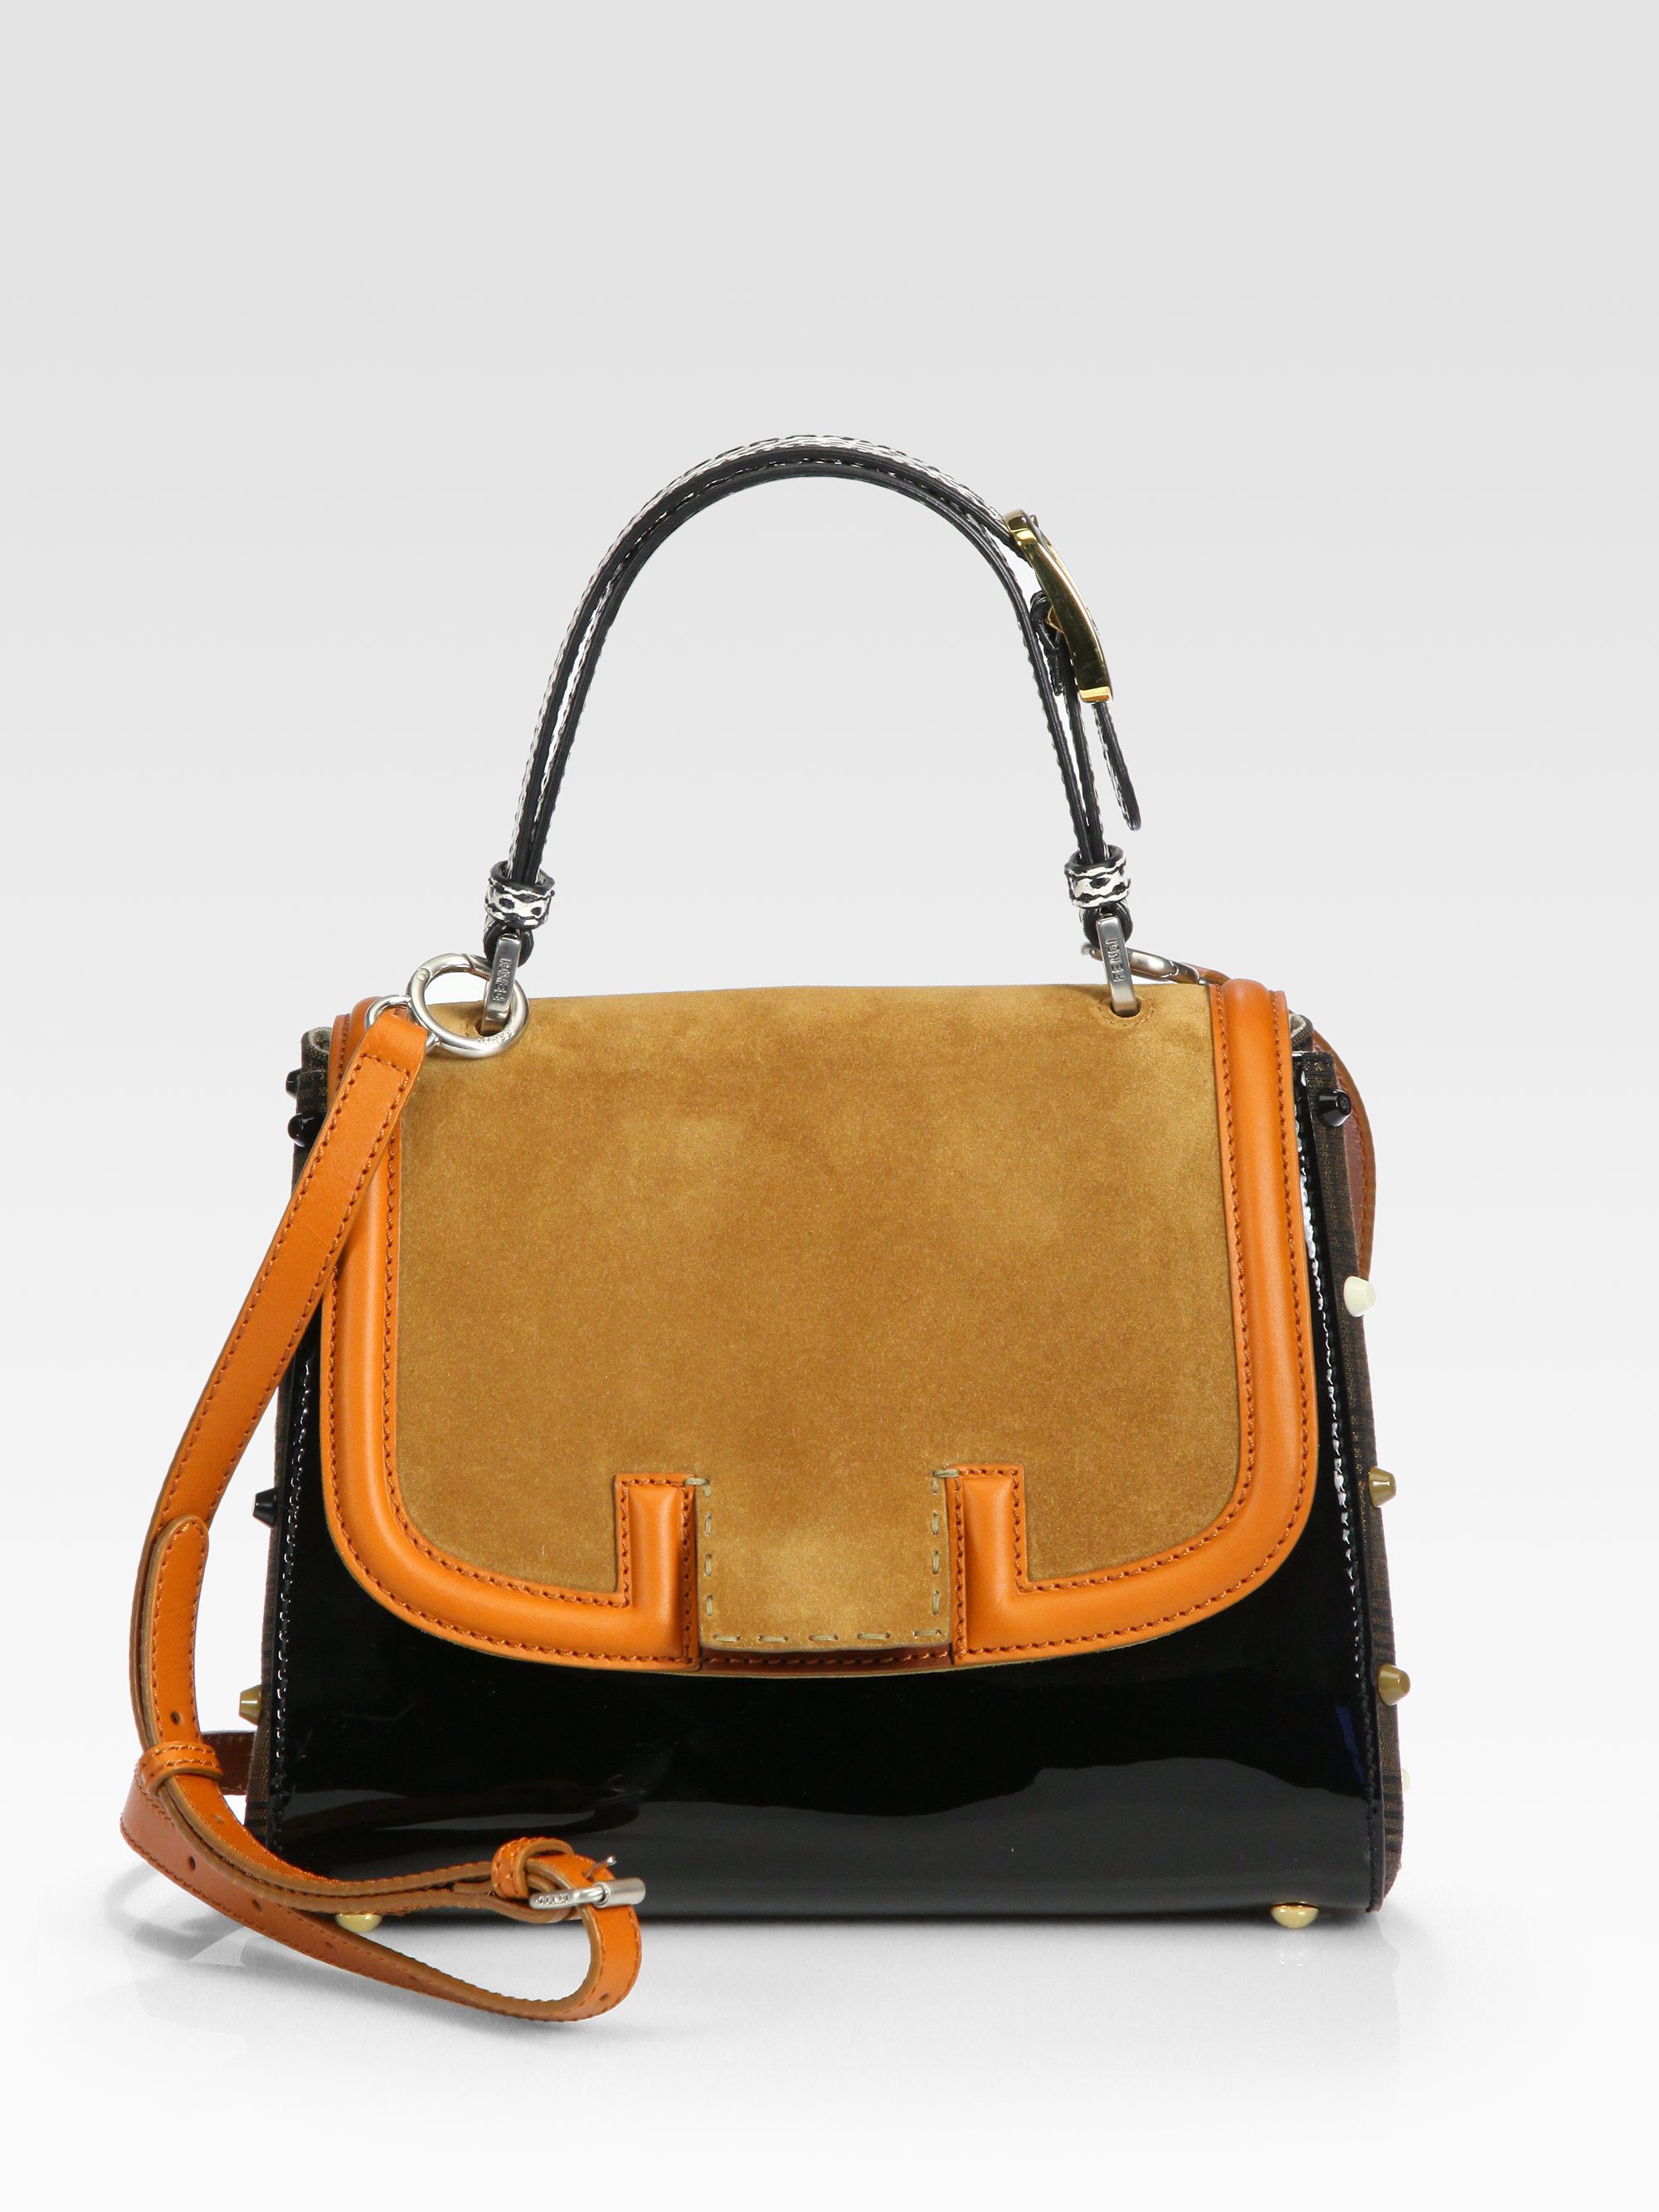 17e06e26bfb1 ... australia lyst fendi silvana suede patent leather python bag in orange  7b898 249b2